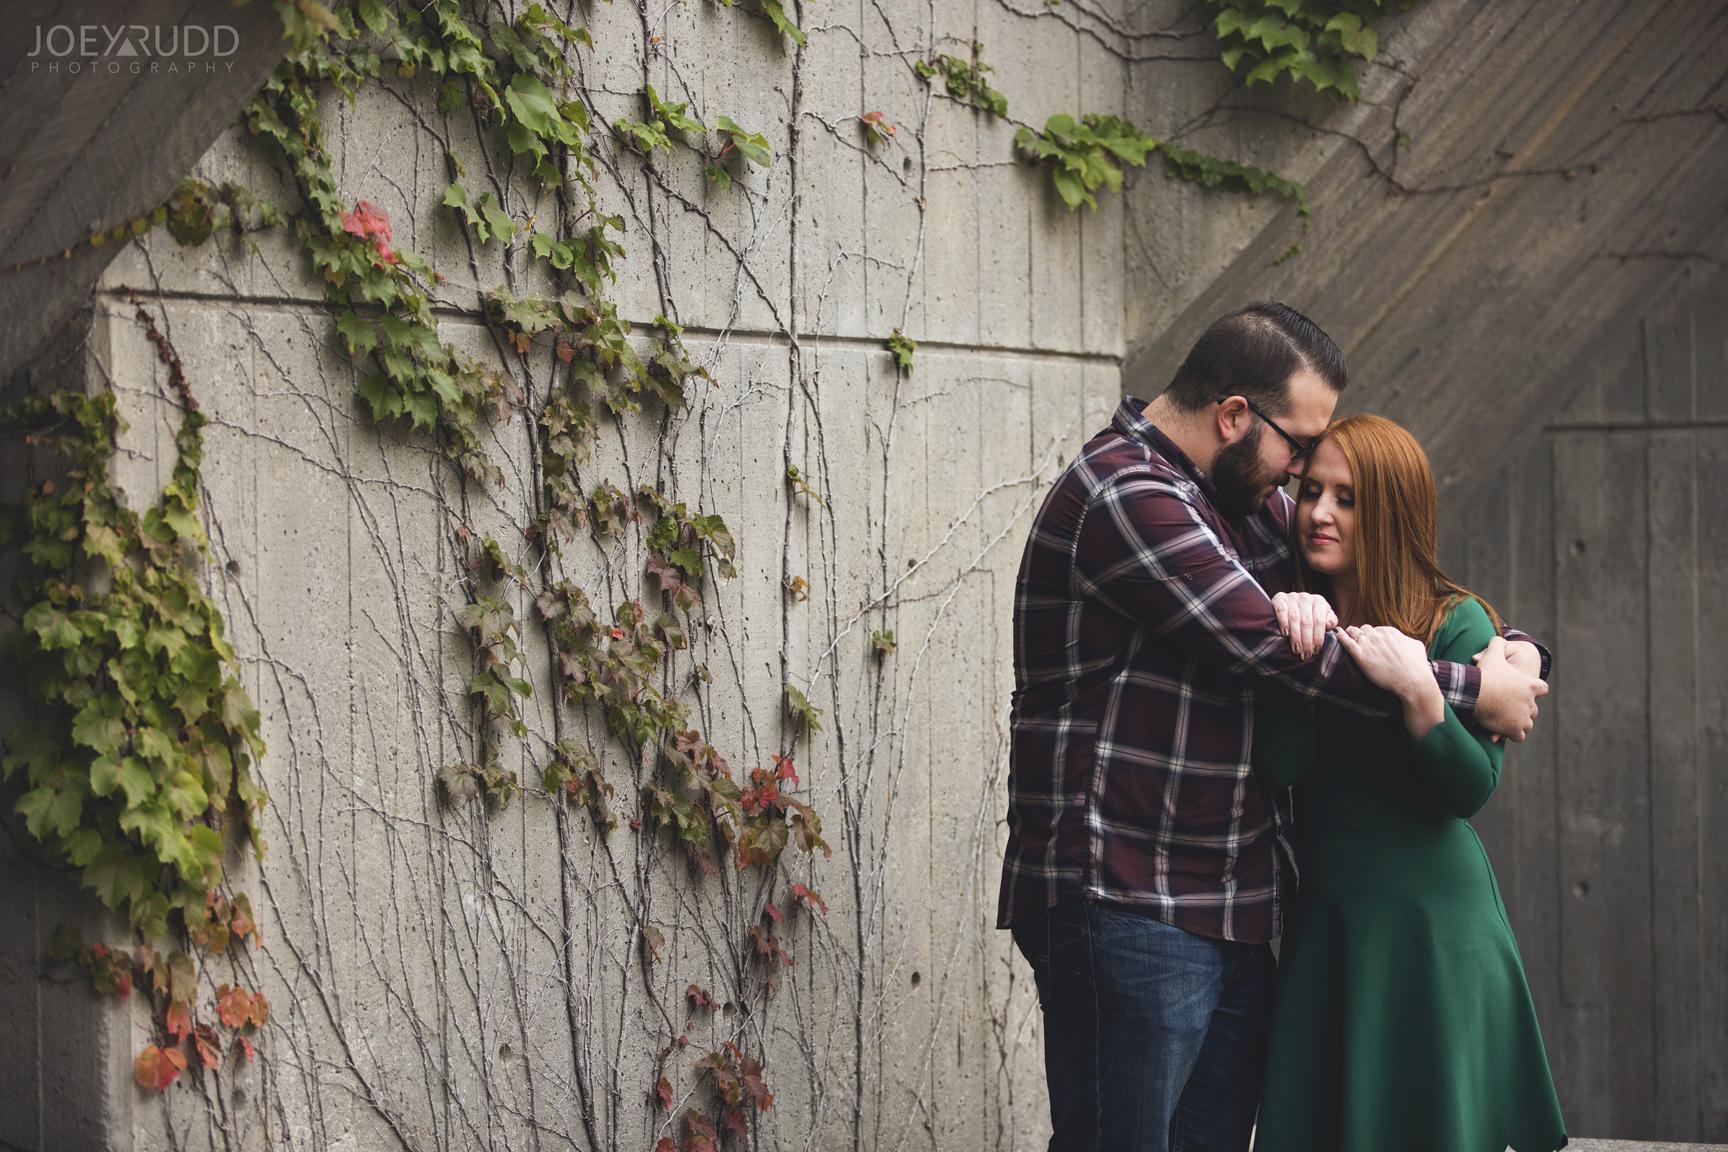 University of Ottawa Engagement by Ottawa Wedding Photographer Joey Rudd Photography University Campus